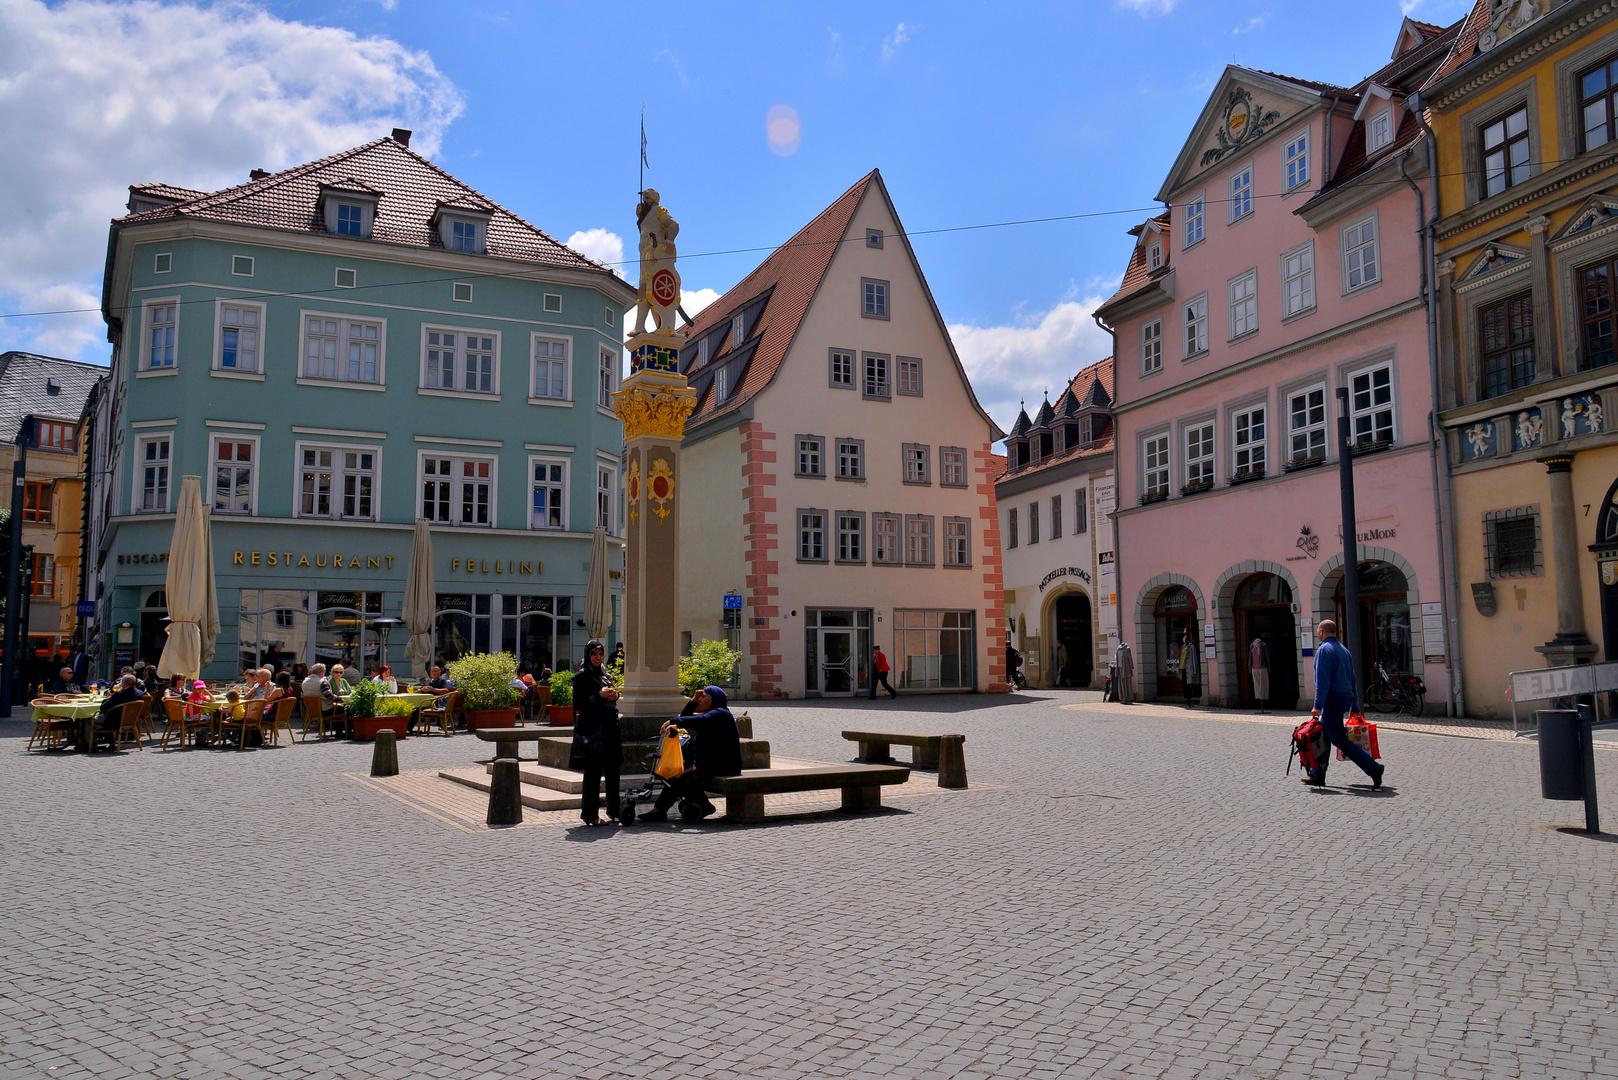 Erfurt, Bilder einer schönen Stadt X (imágenes de una bella ciudad X)